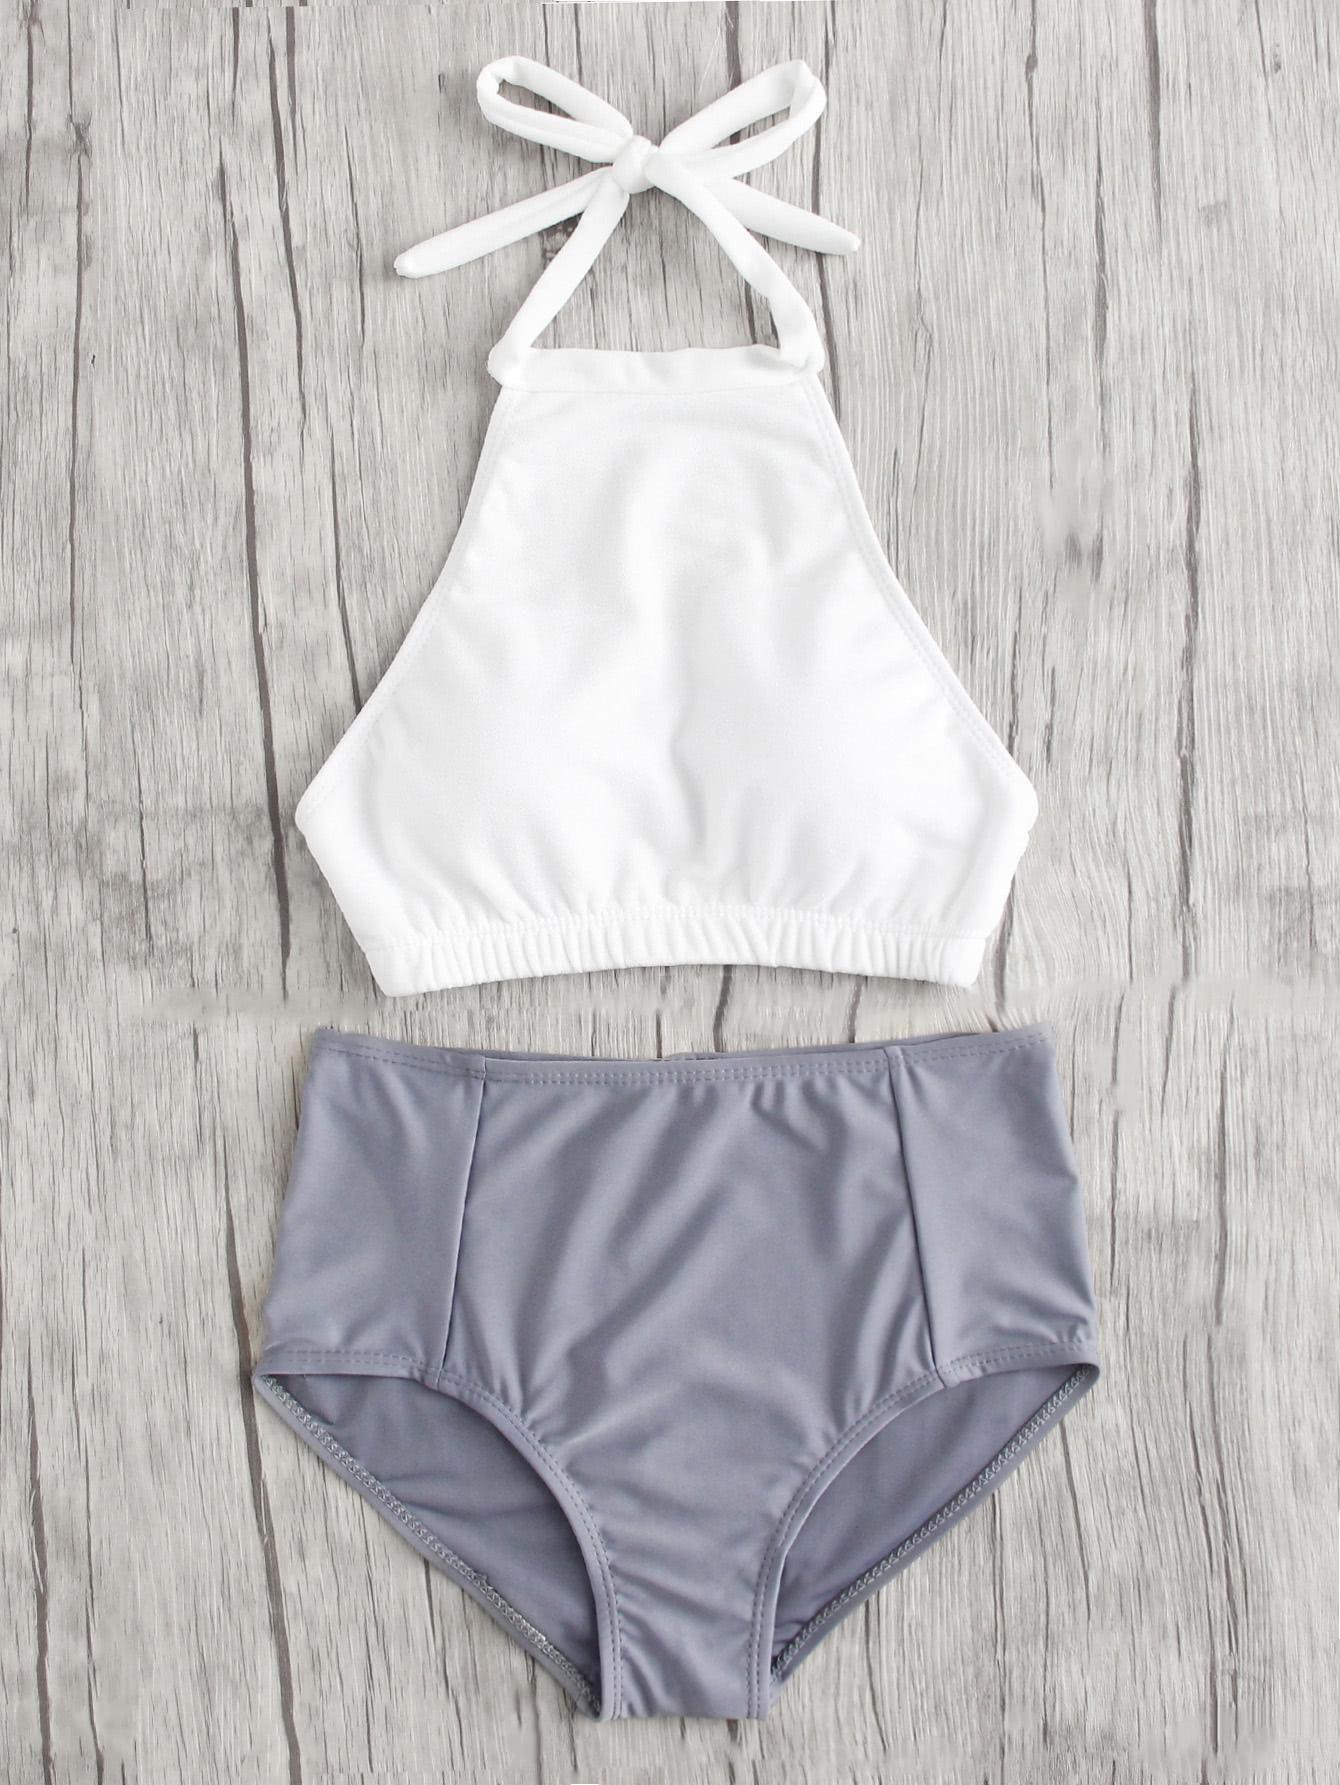 8b4dccd5d4 #Spring #AdoreWe #SheIn - #SheIn Mix And Match High Neck Bikini Set -  AdoreWe.com